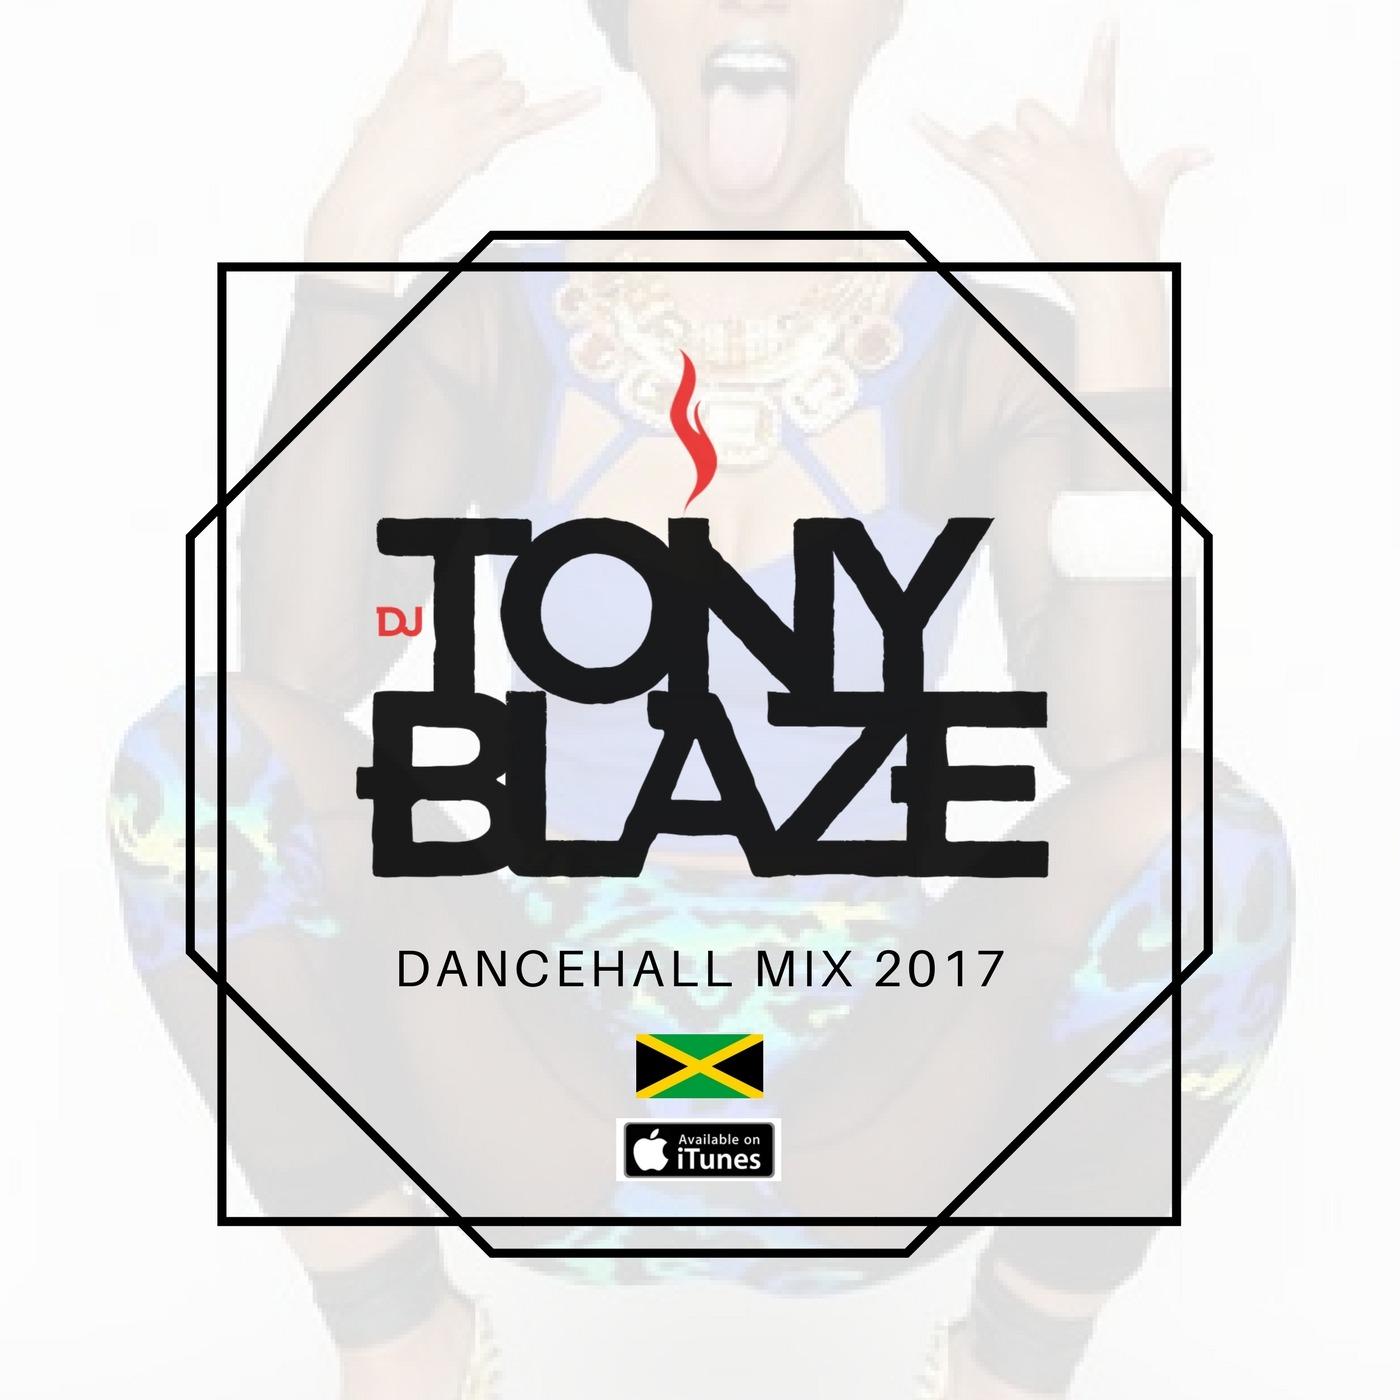 Dj Tony Blaze's Podcast - TopPodcast com